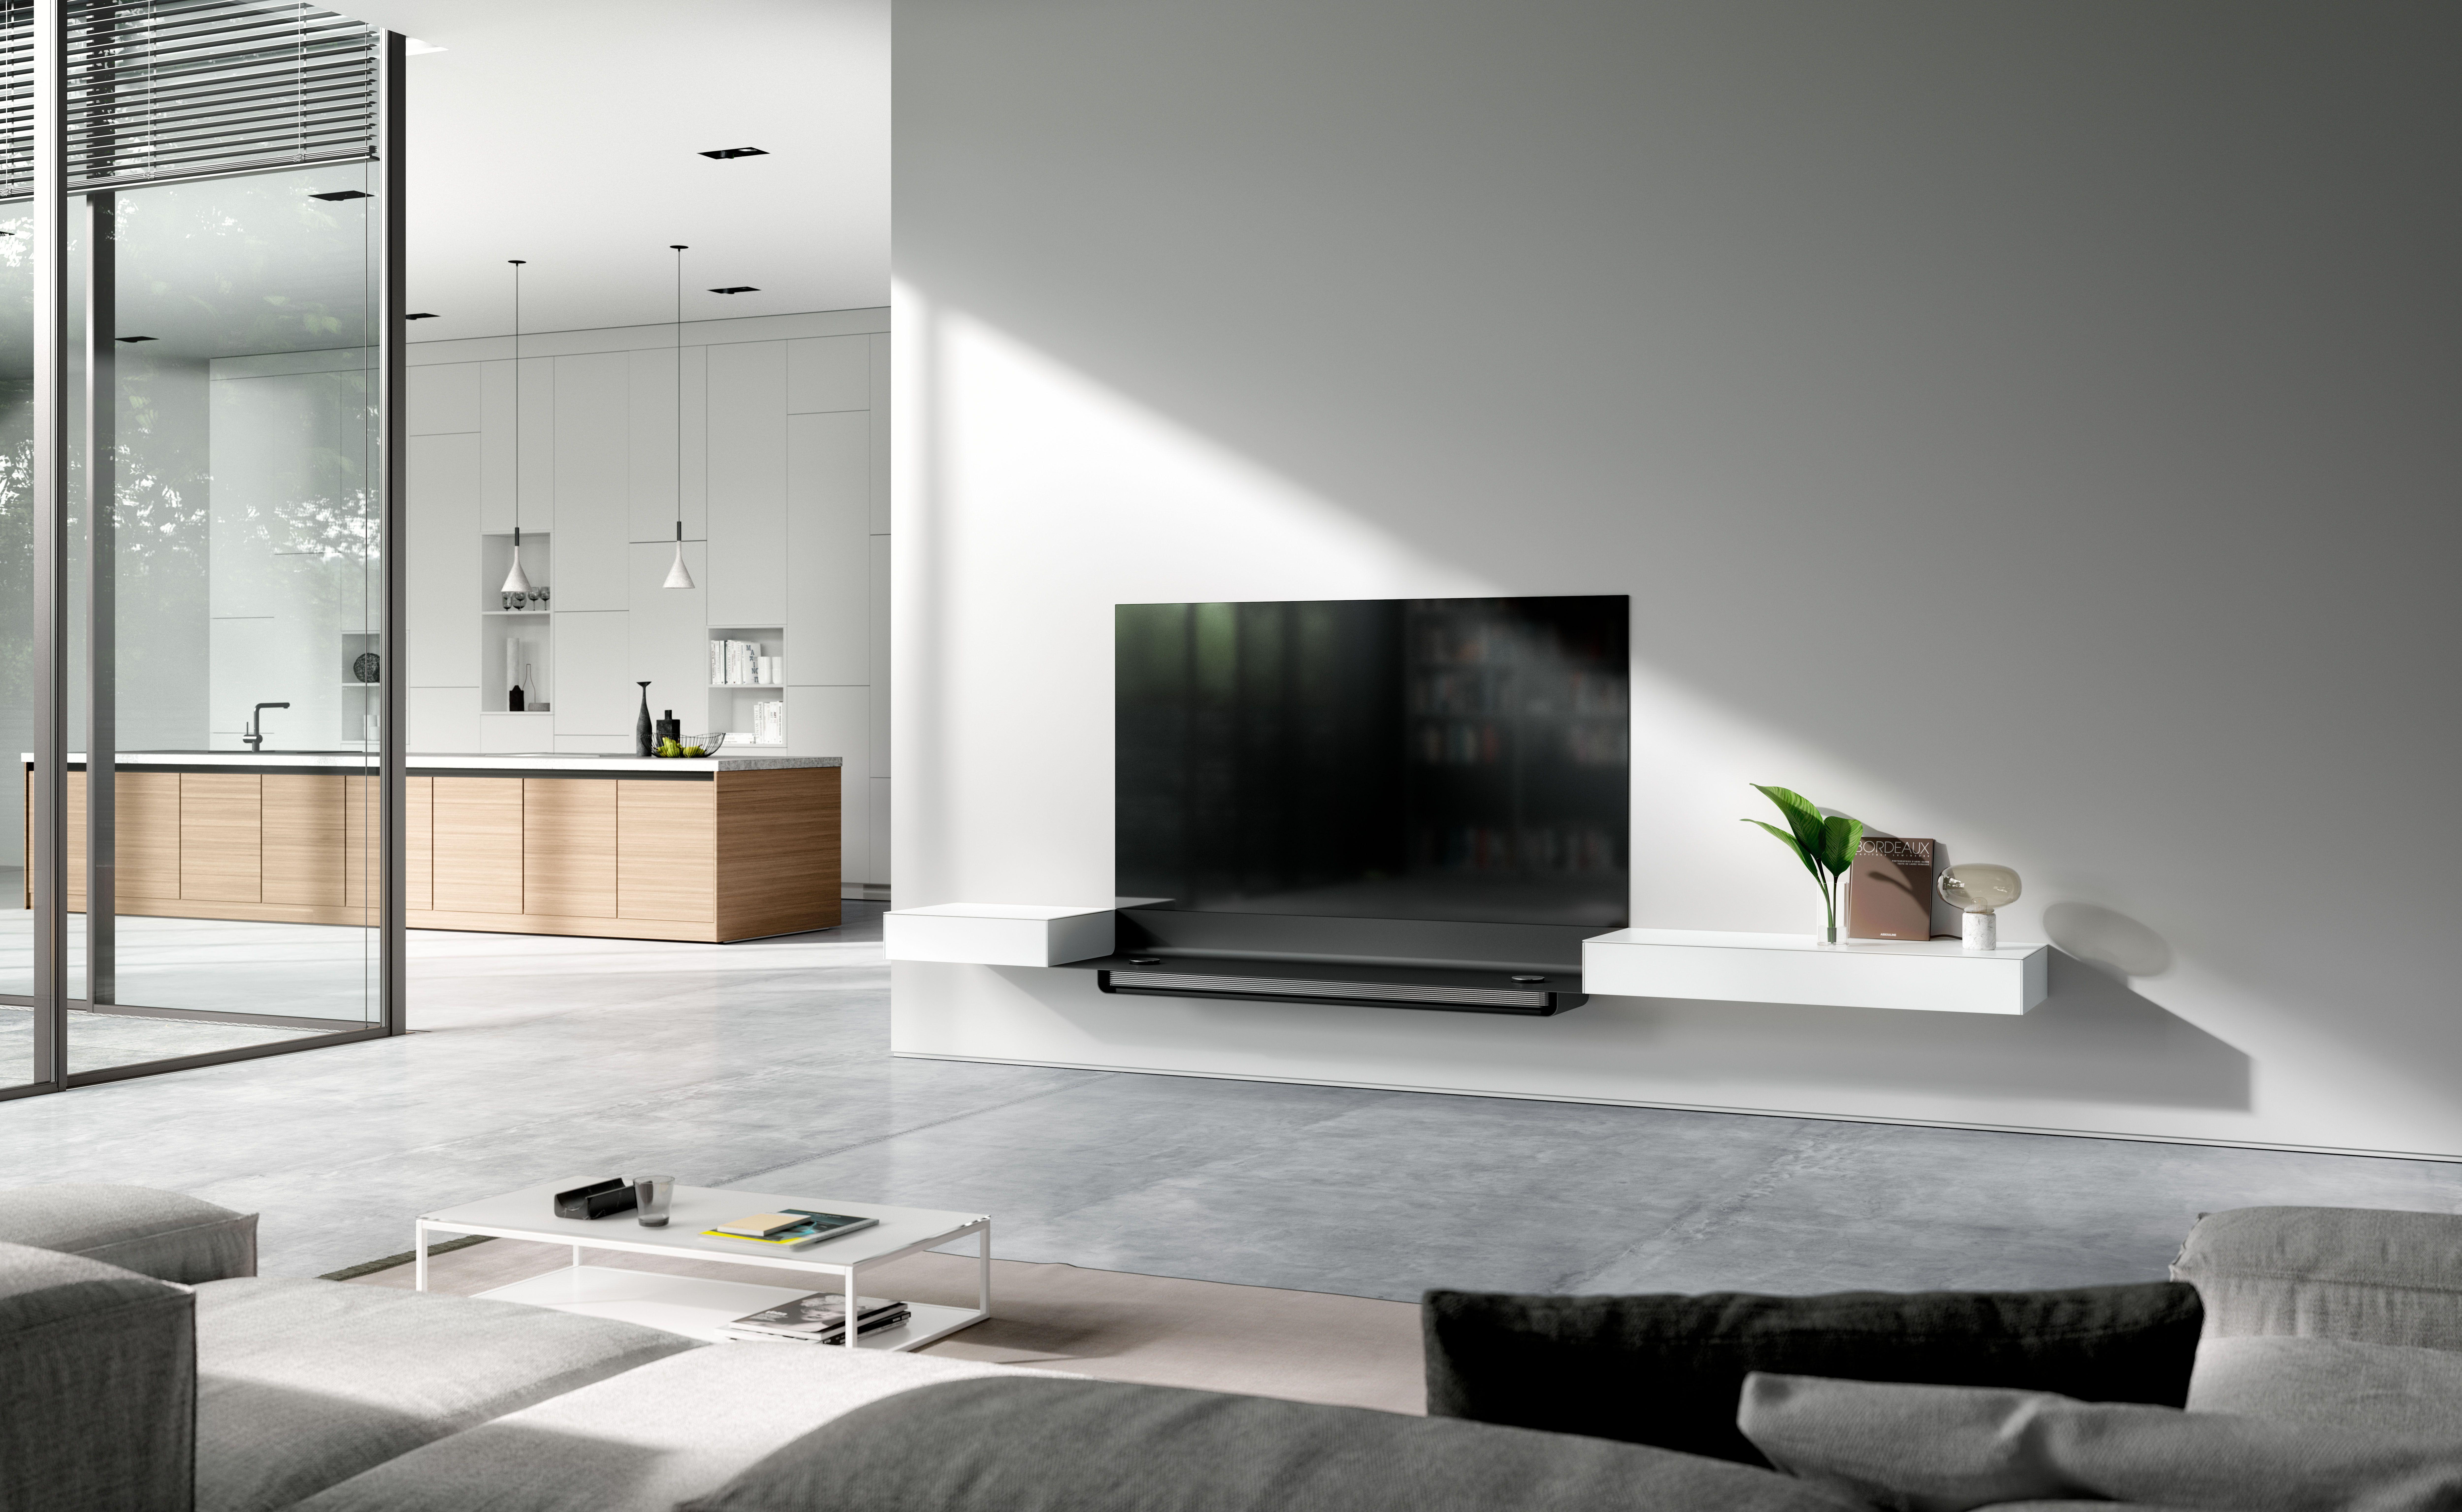 Tv Meubel Vt Wonen.Air Signature Tv Meubel Spectral Smartfurniture